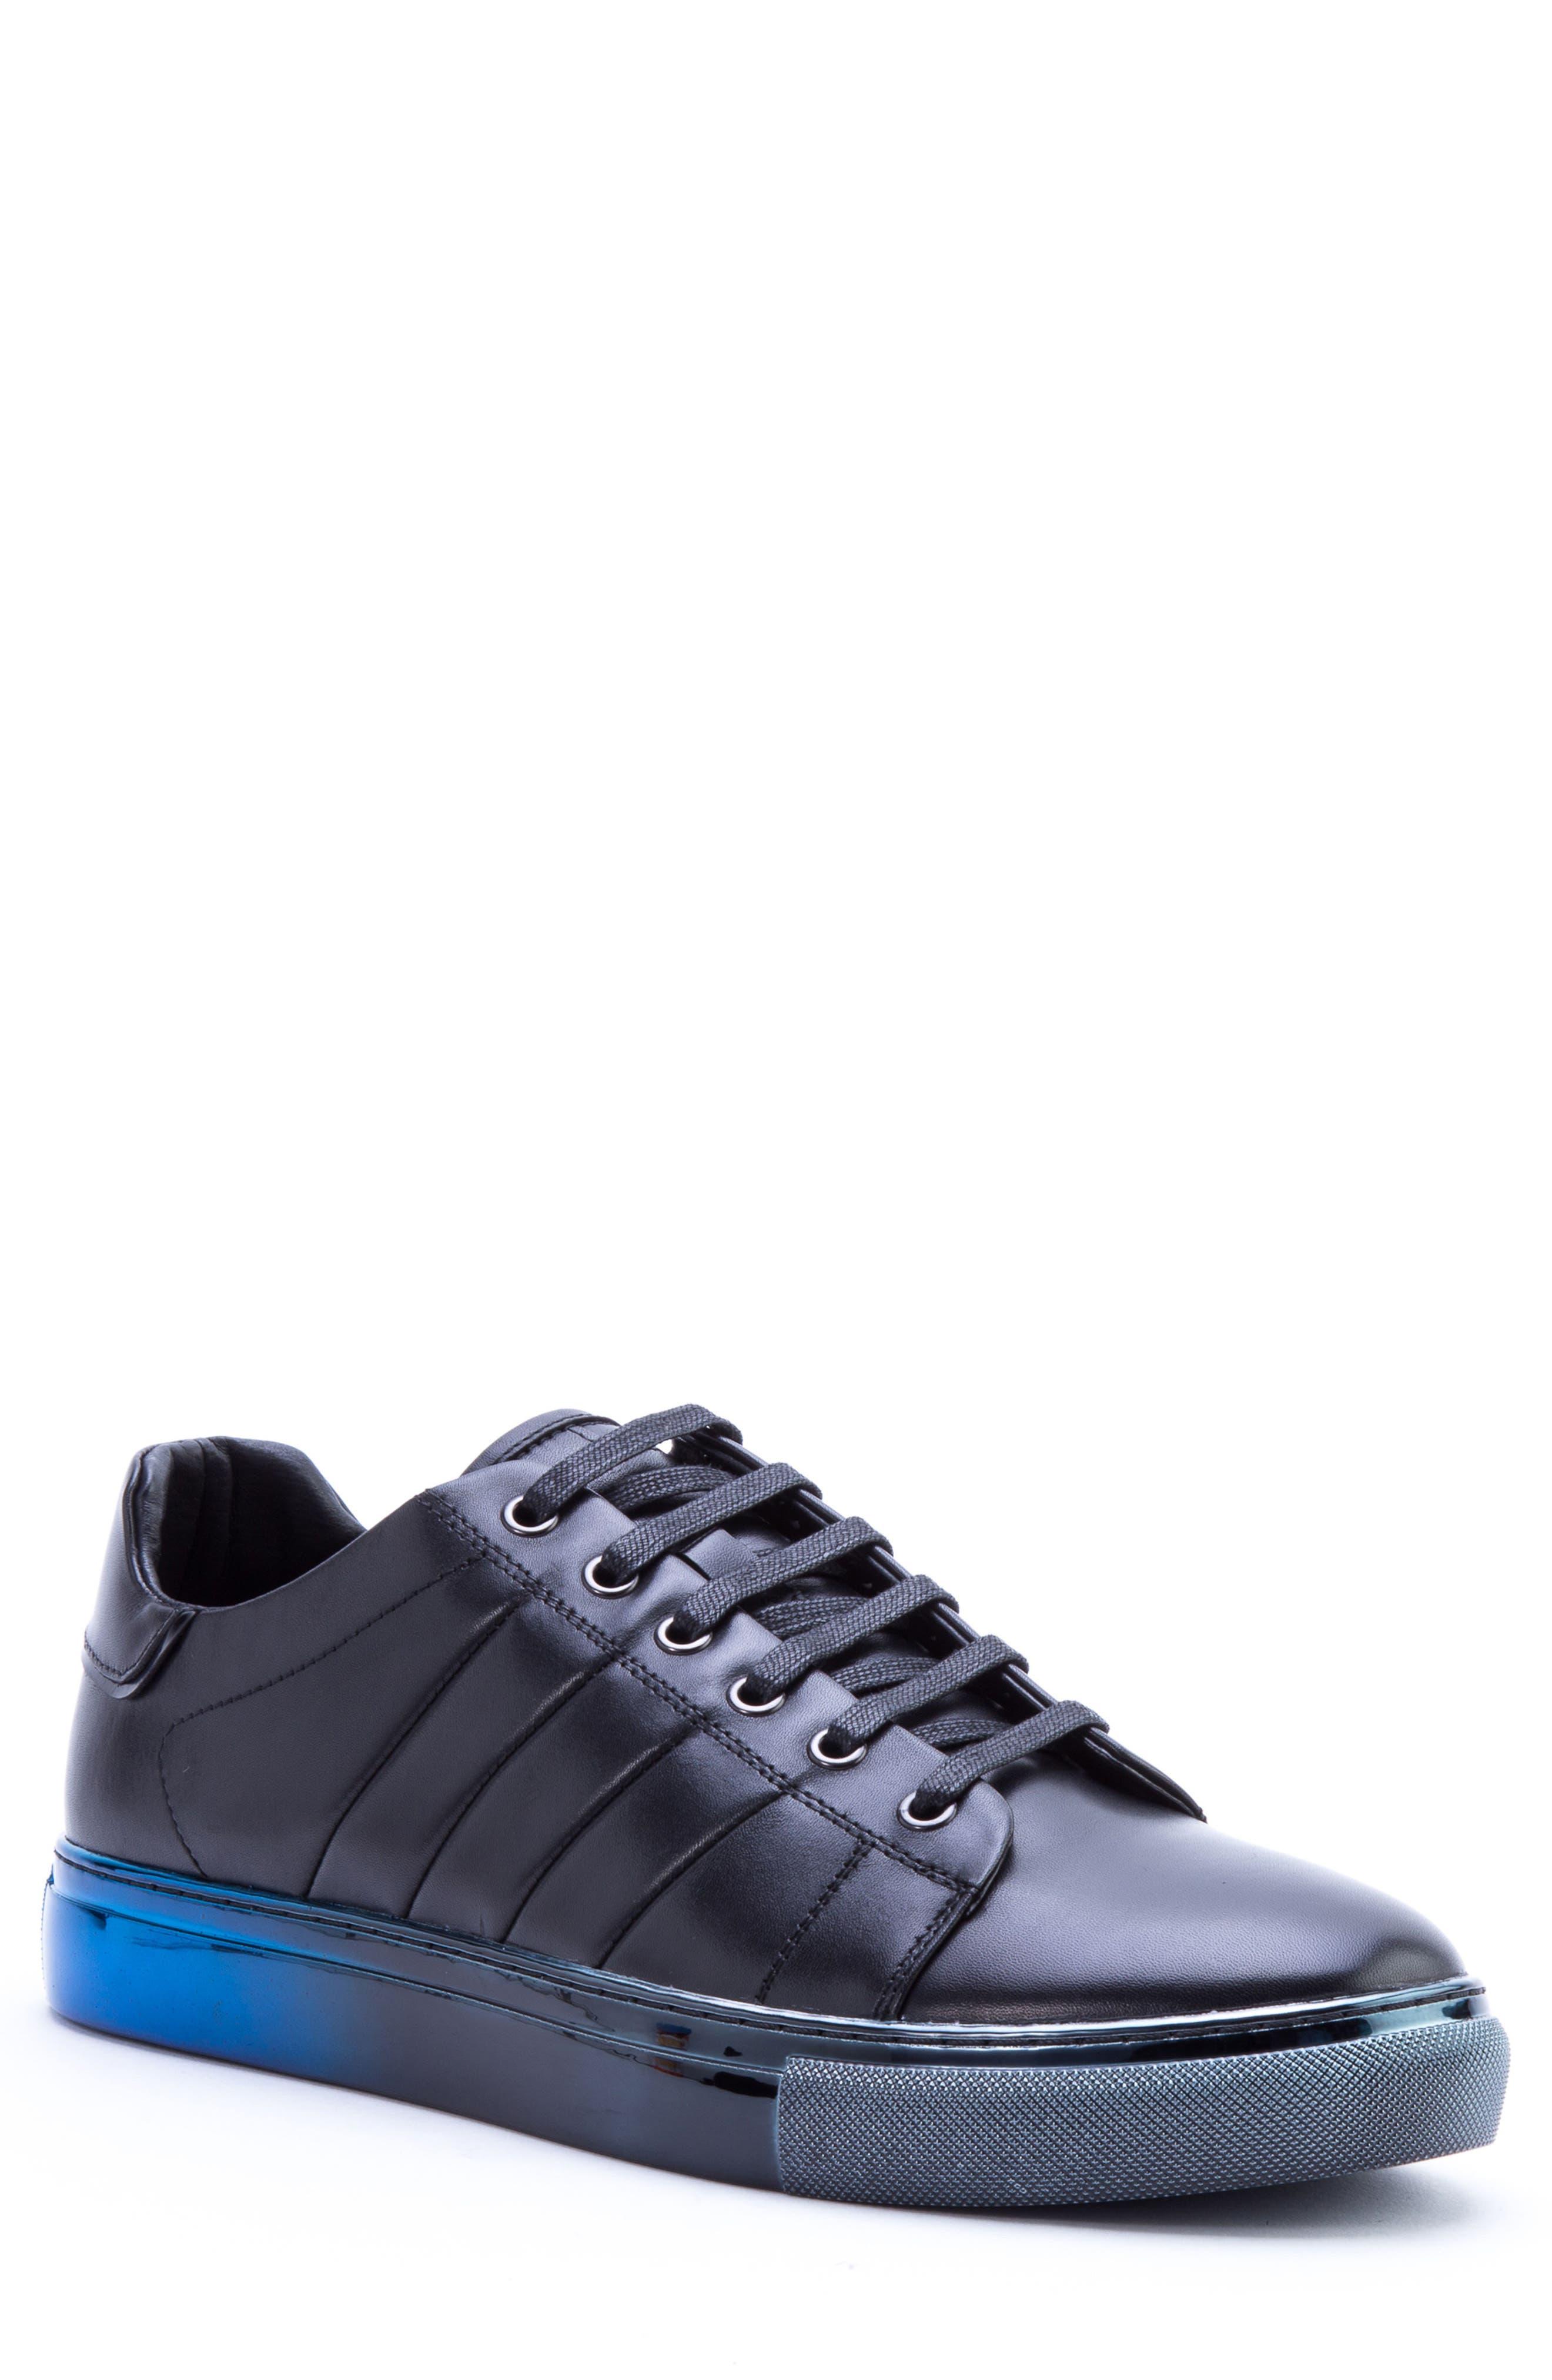 BADGLEY MISCHKA Brando Sneaker